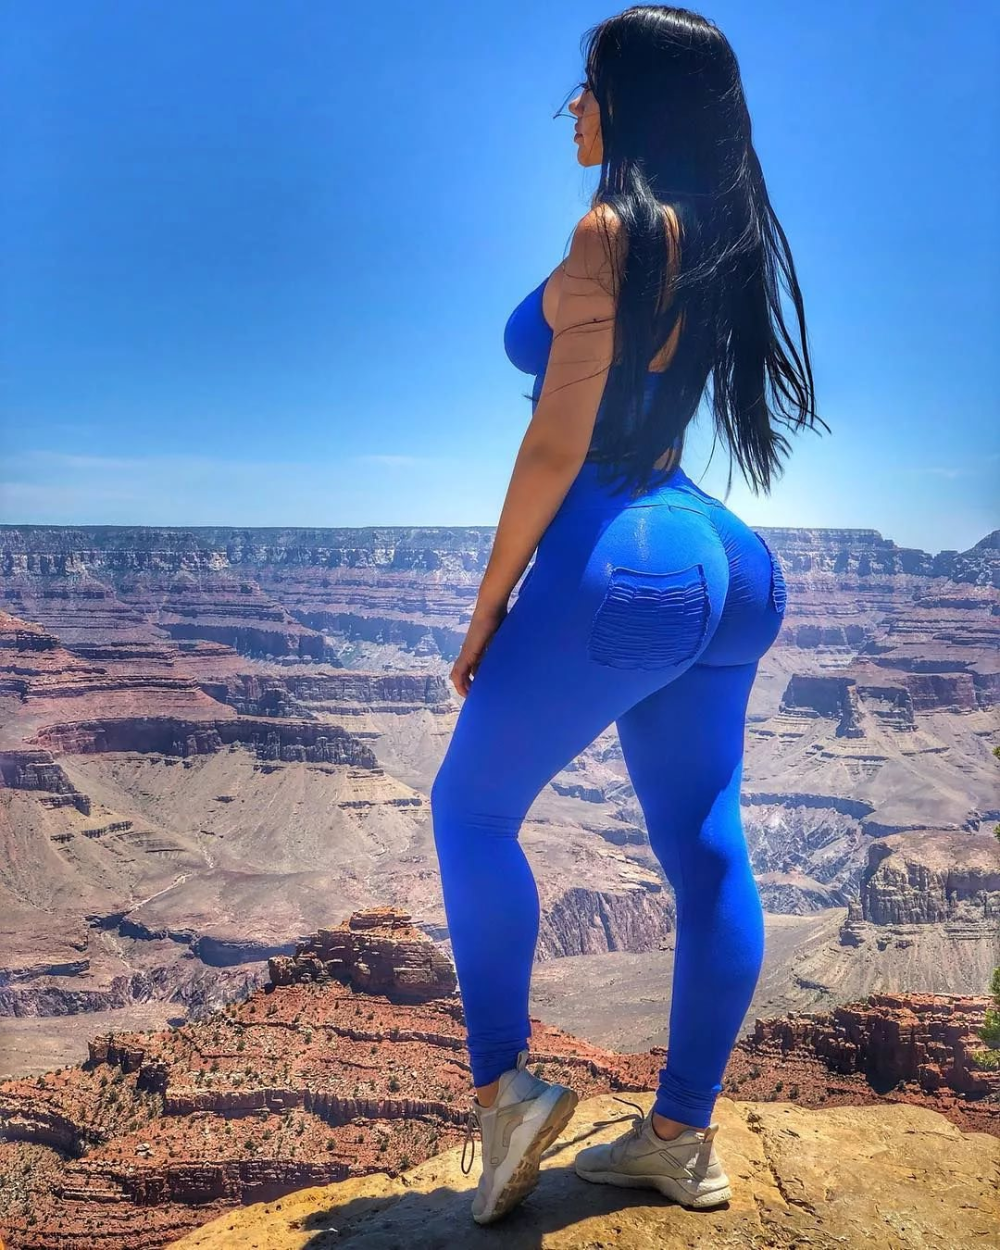 Pics of tight hot butt